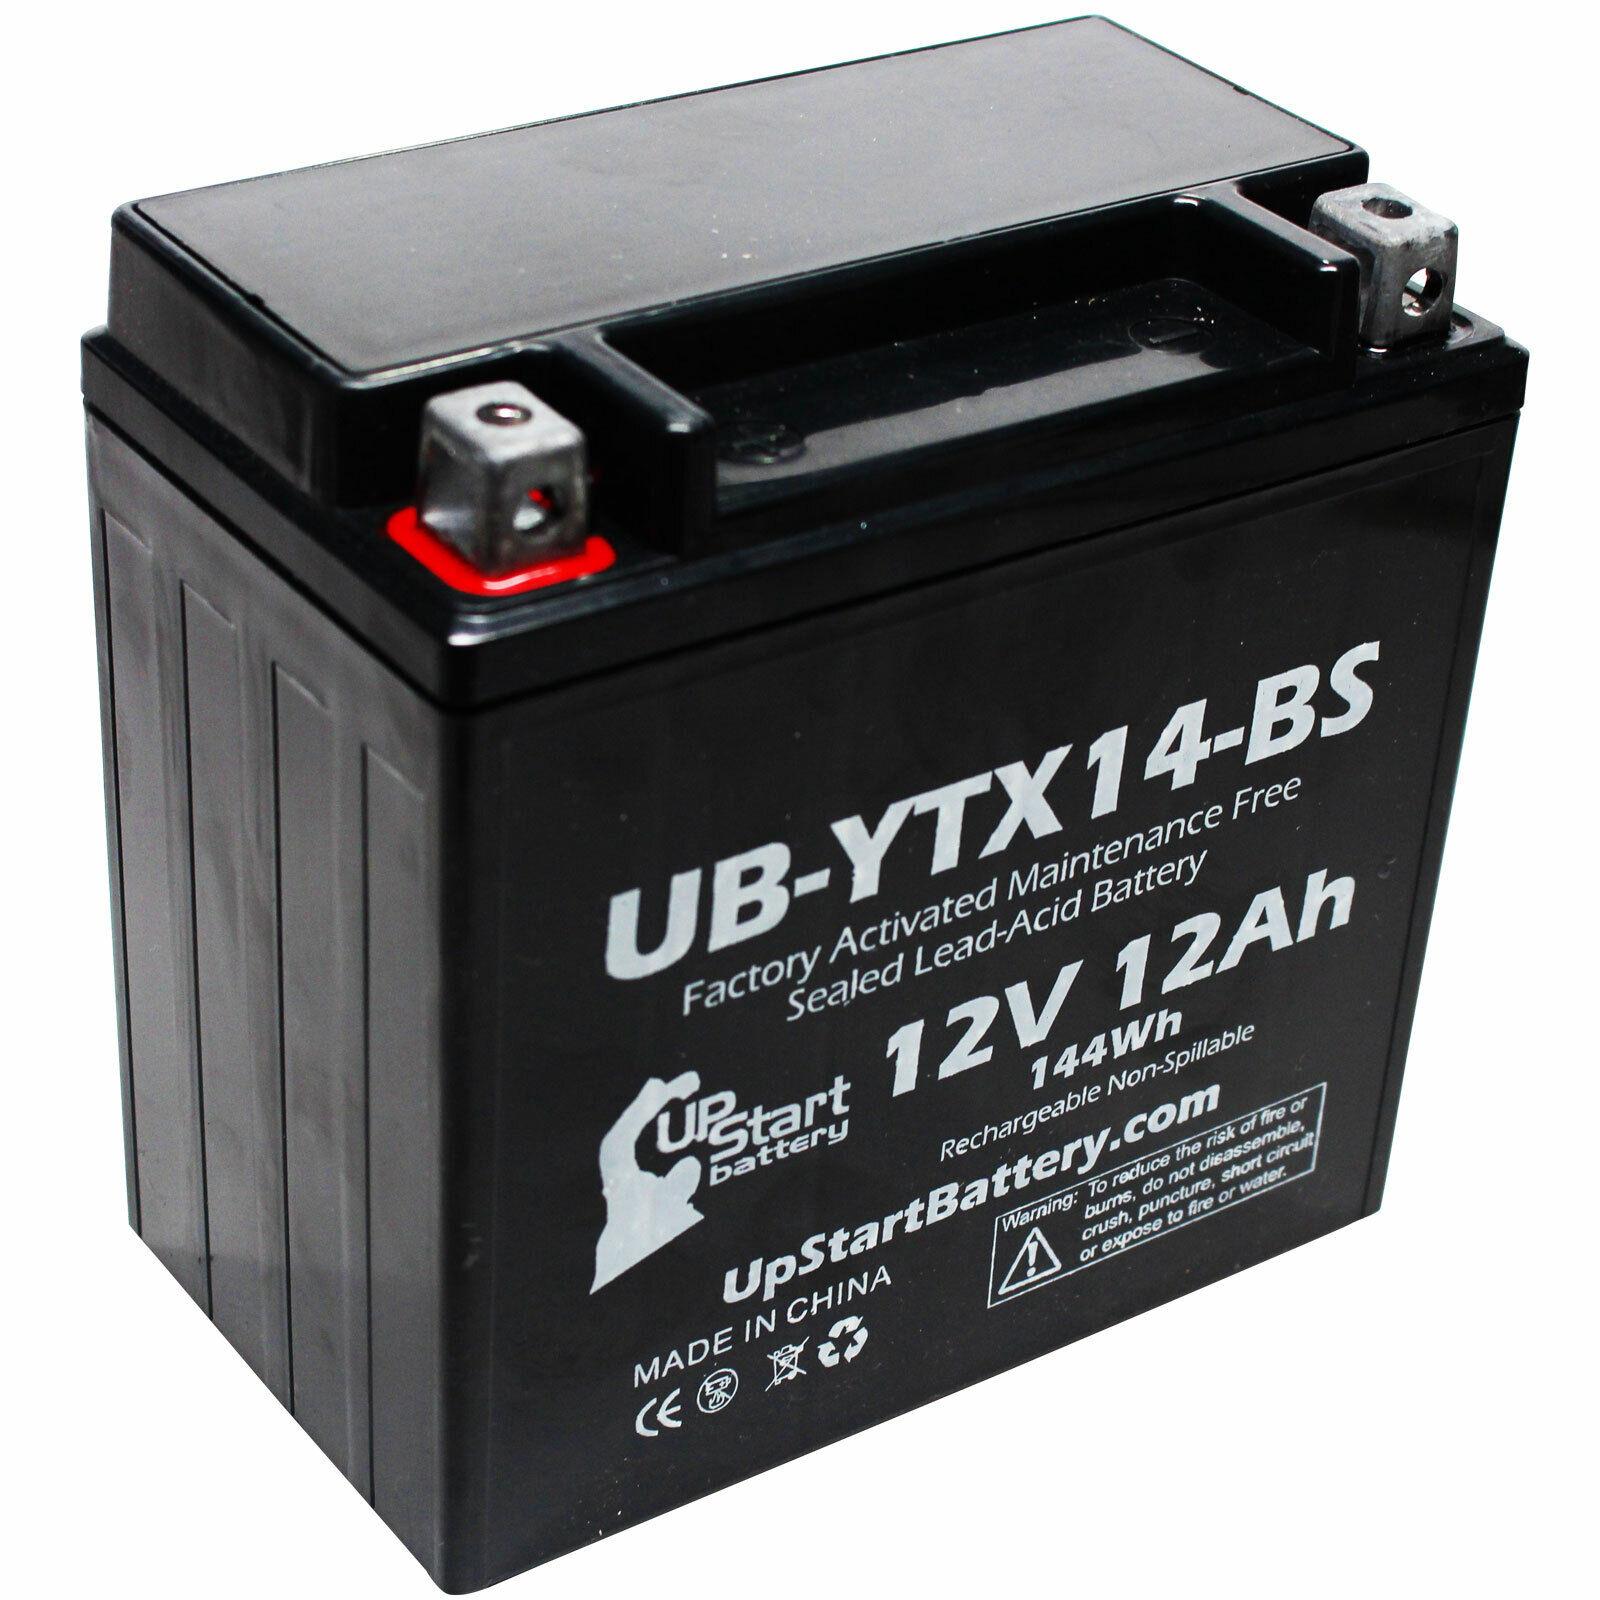 12V 12AH Battery for 1998 Honda TRX300,FW FourTrax 300, 4x4 300 CC